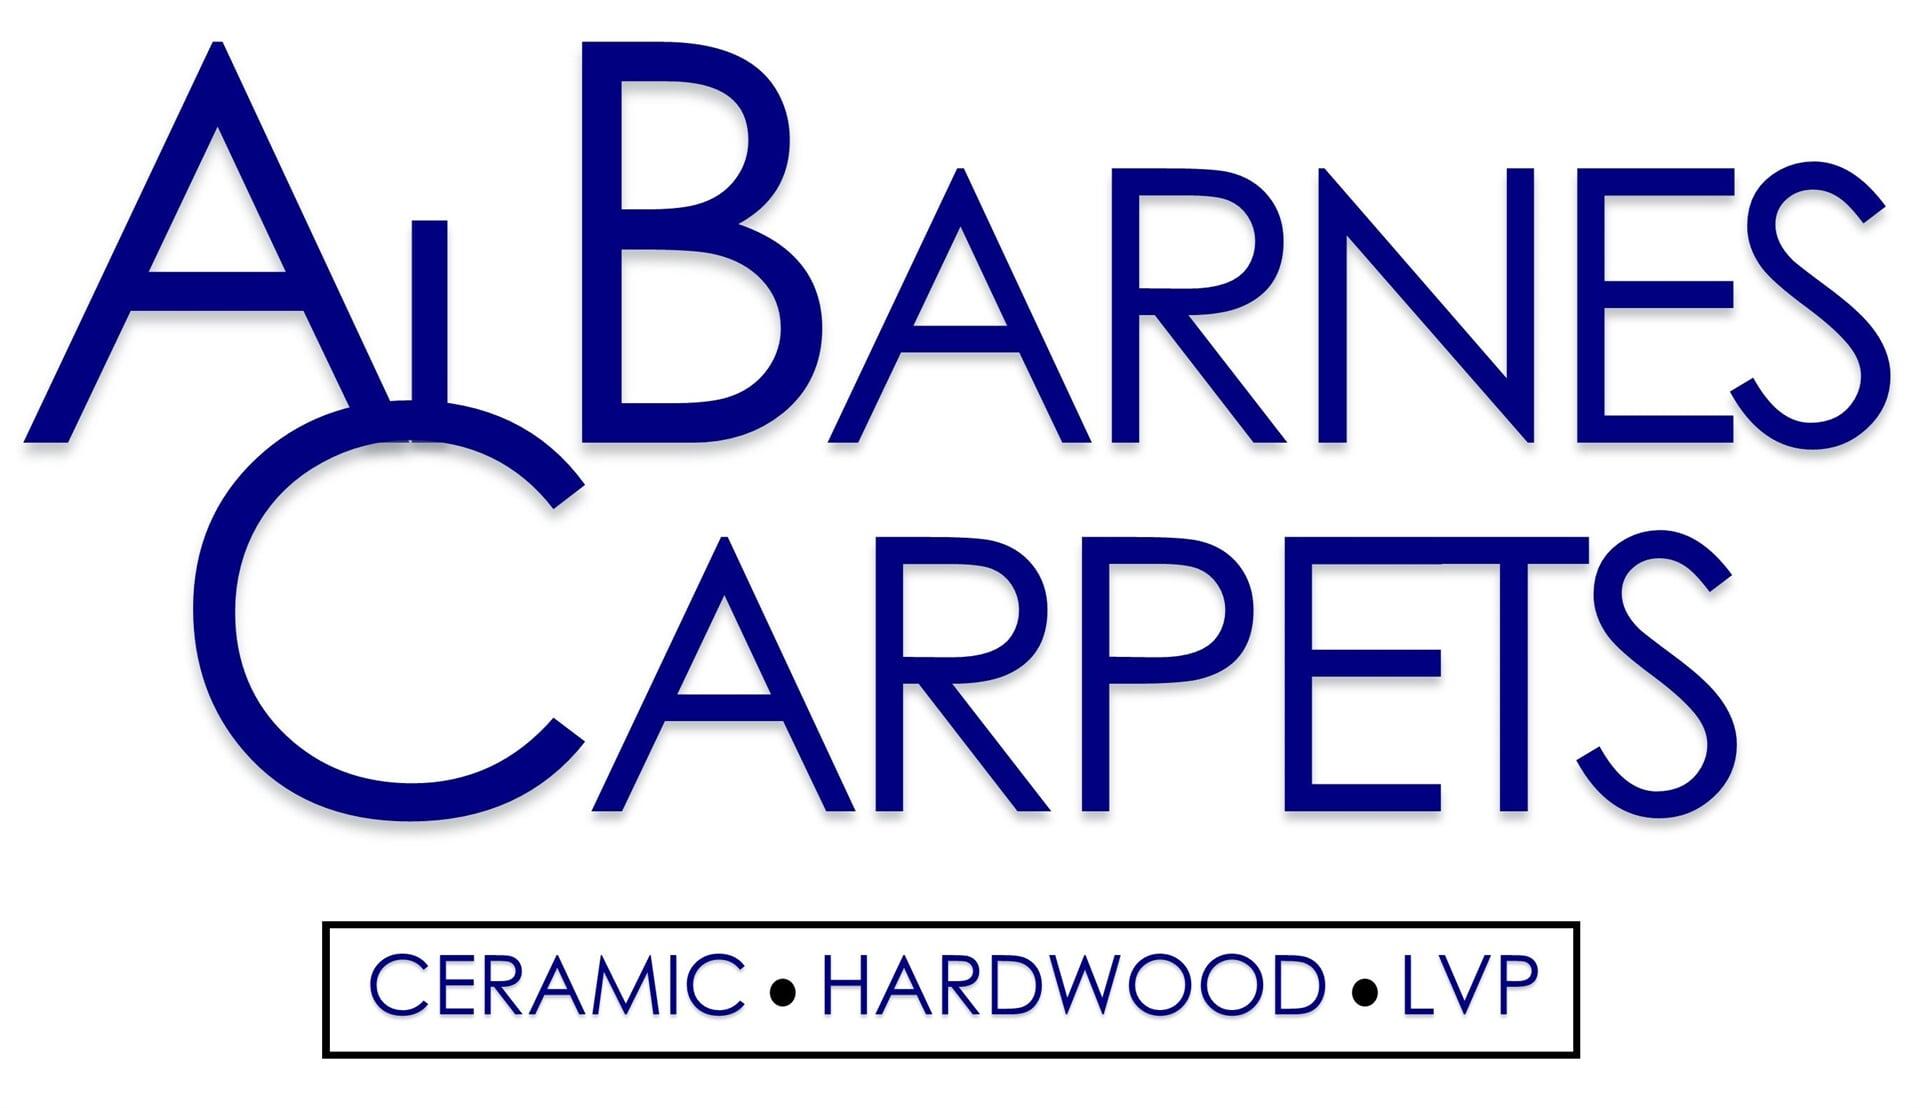 Al Barnes Carpets in Cedar Point, NC